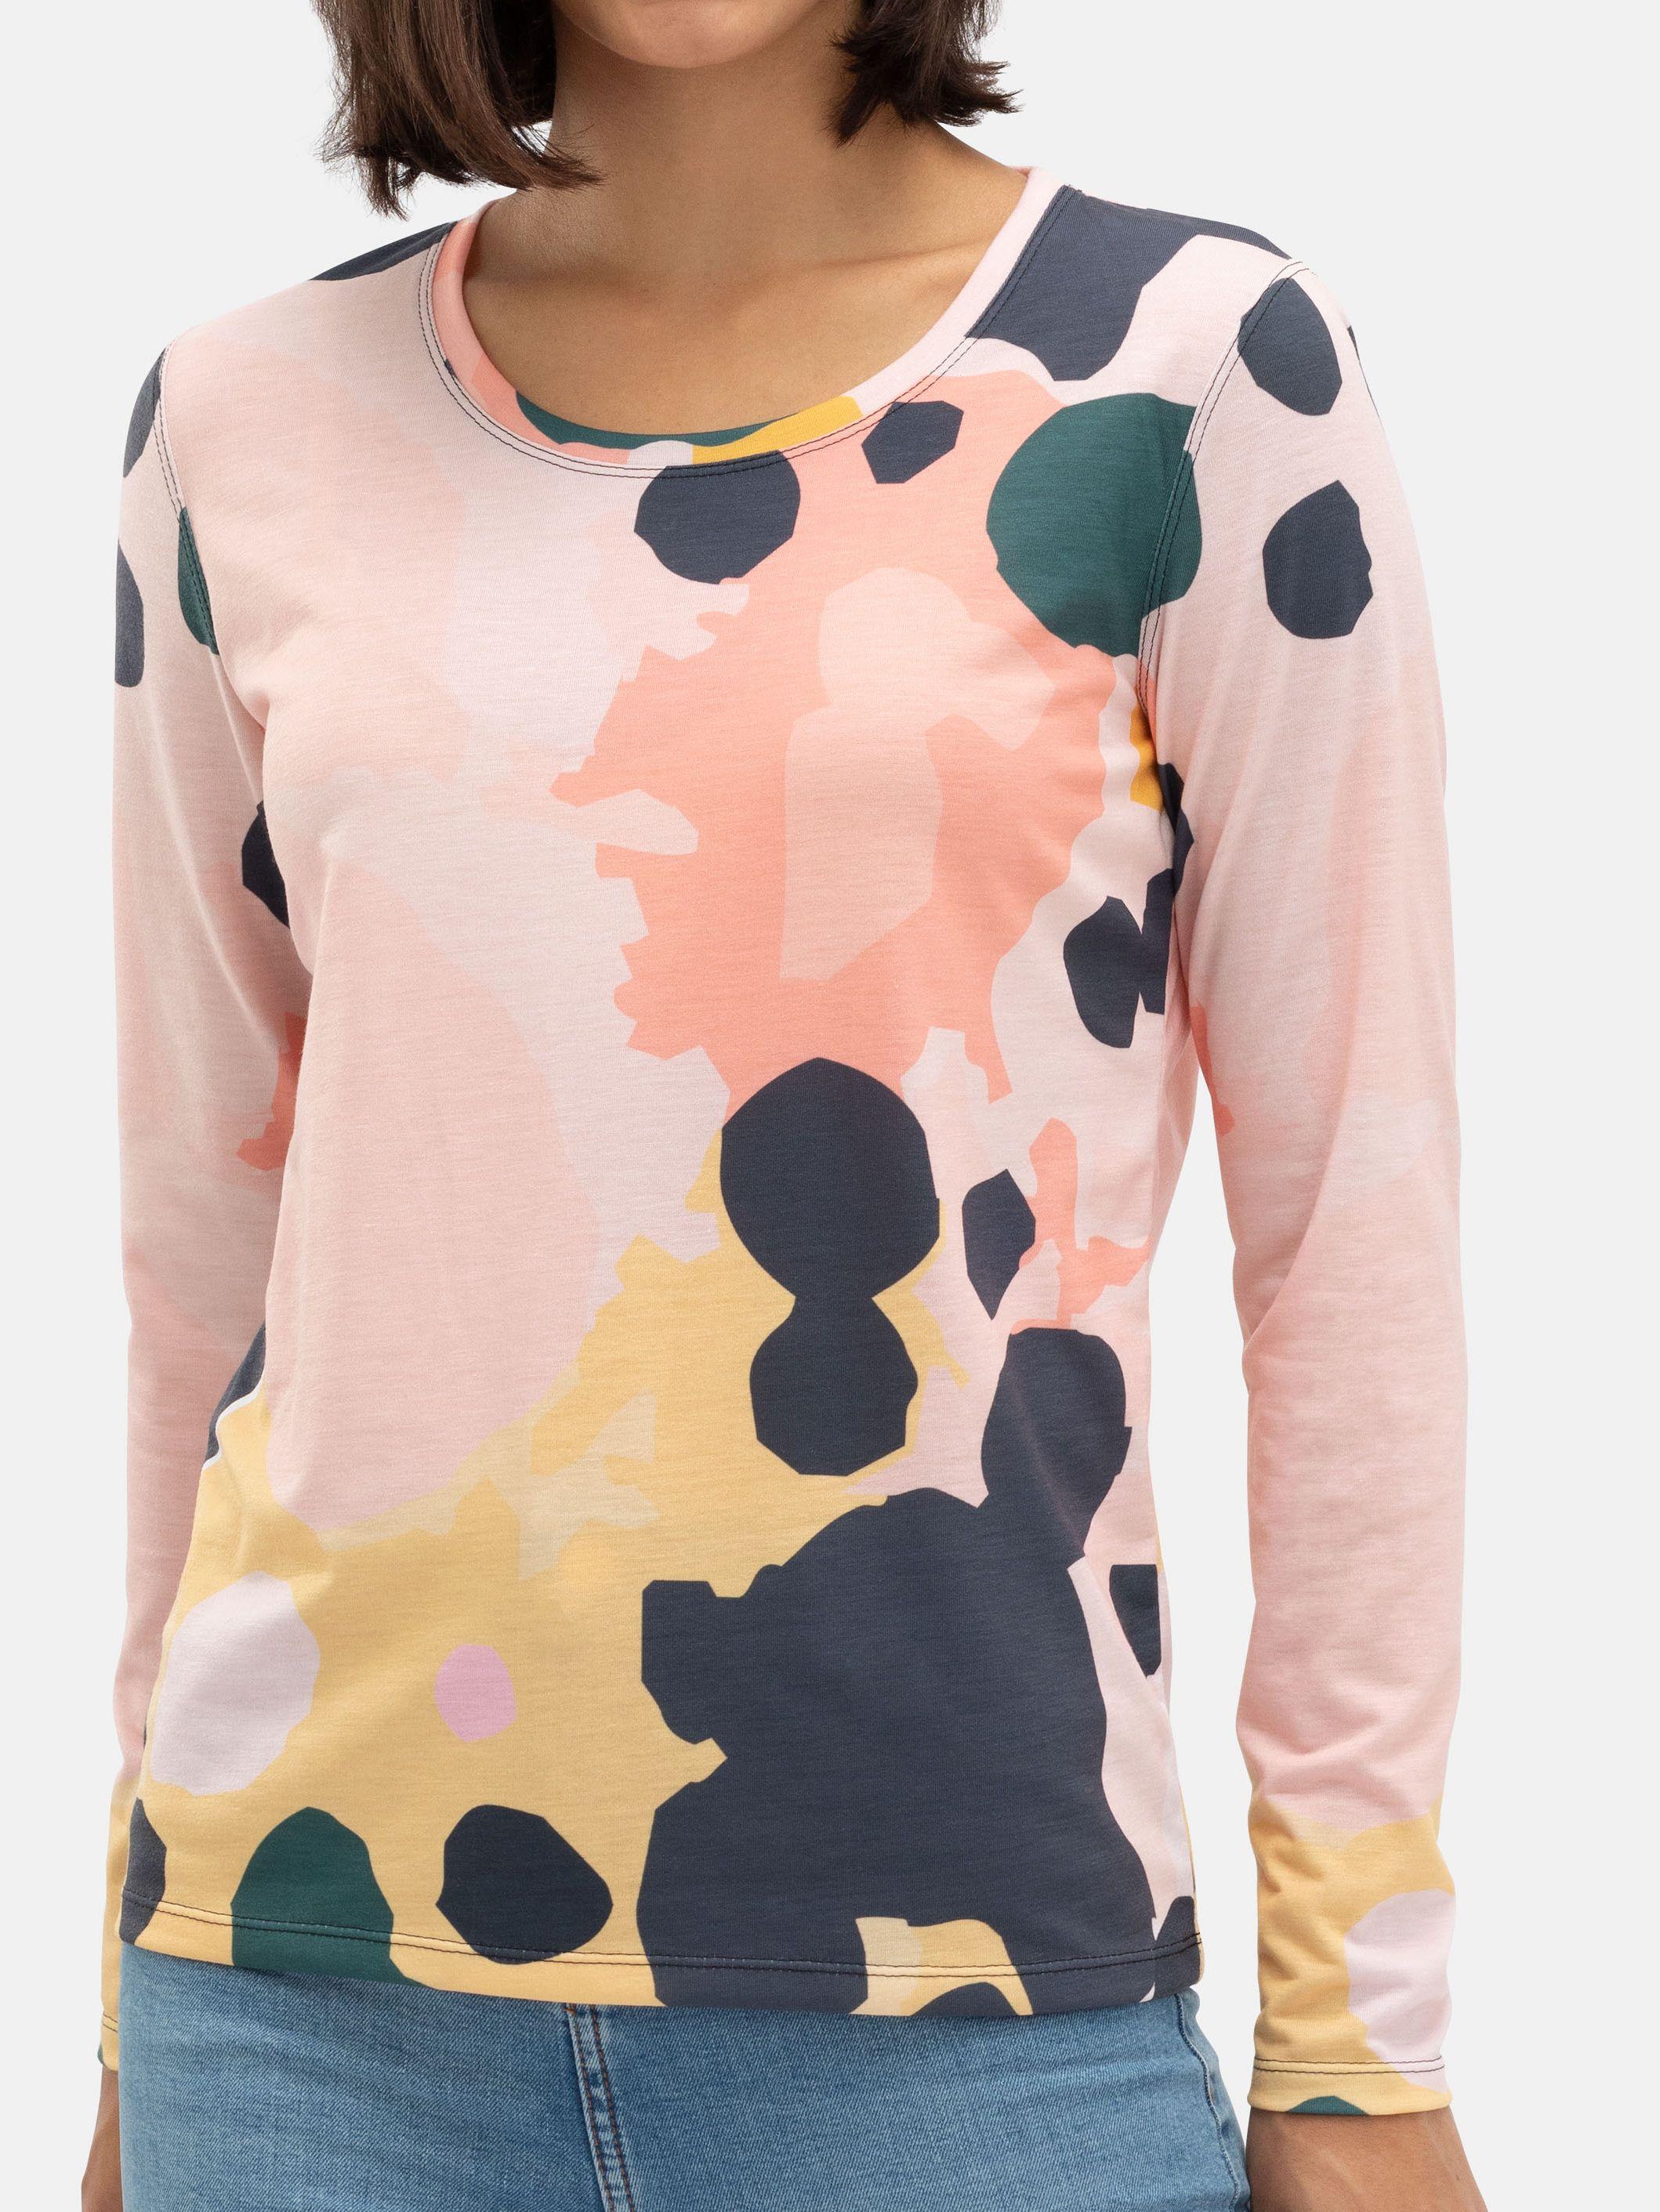 Women's Custom Regular Fit Long Sleeve T-Shirt